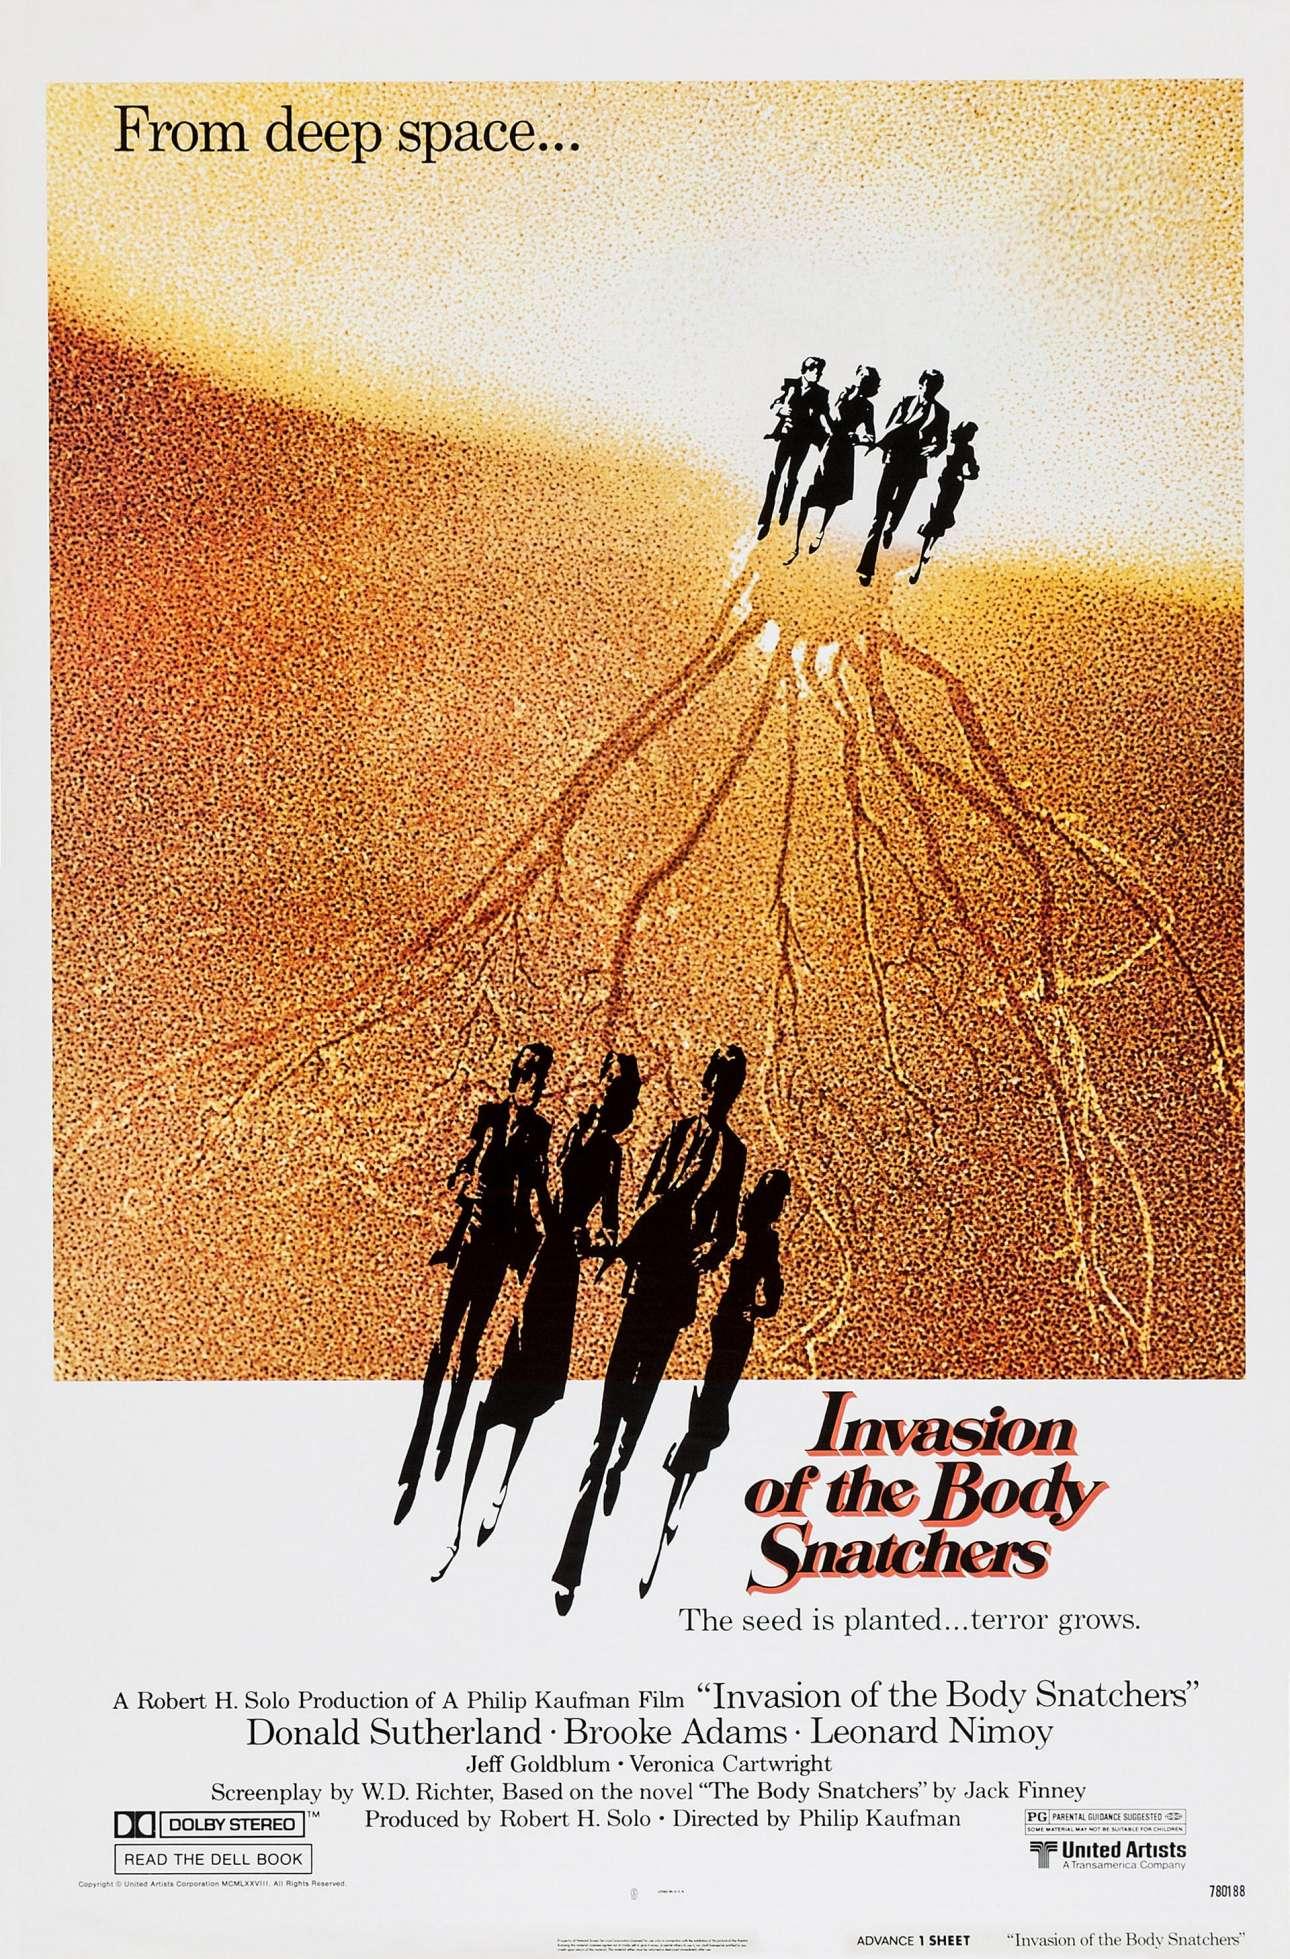 «Invasion of the Body Snatchers», 1978. «Ούτε στα πιο τρελά μου όνειρα δεν θα μπορούσα να είχα προβλέψει την καριέρα που είχα»